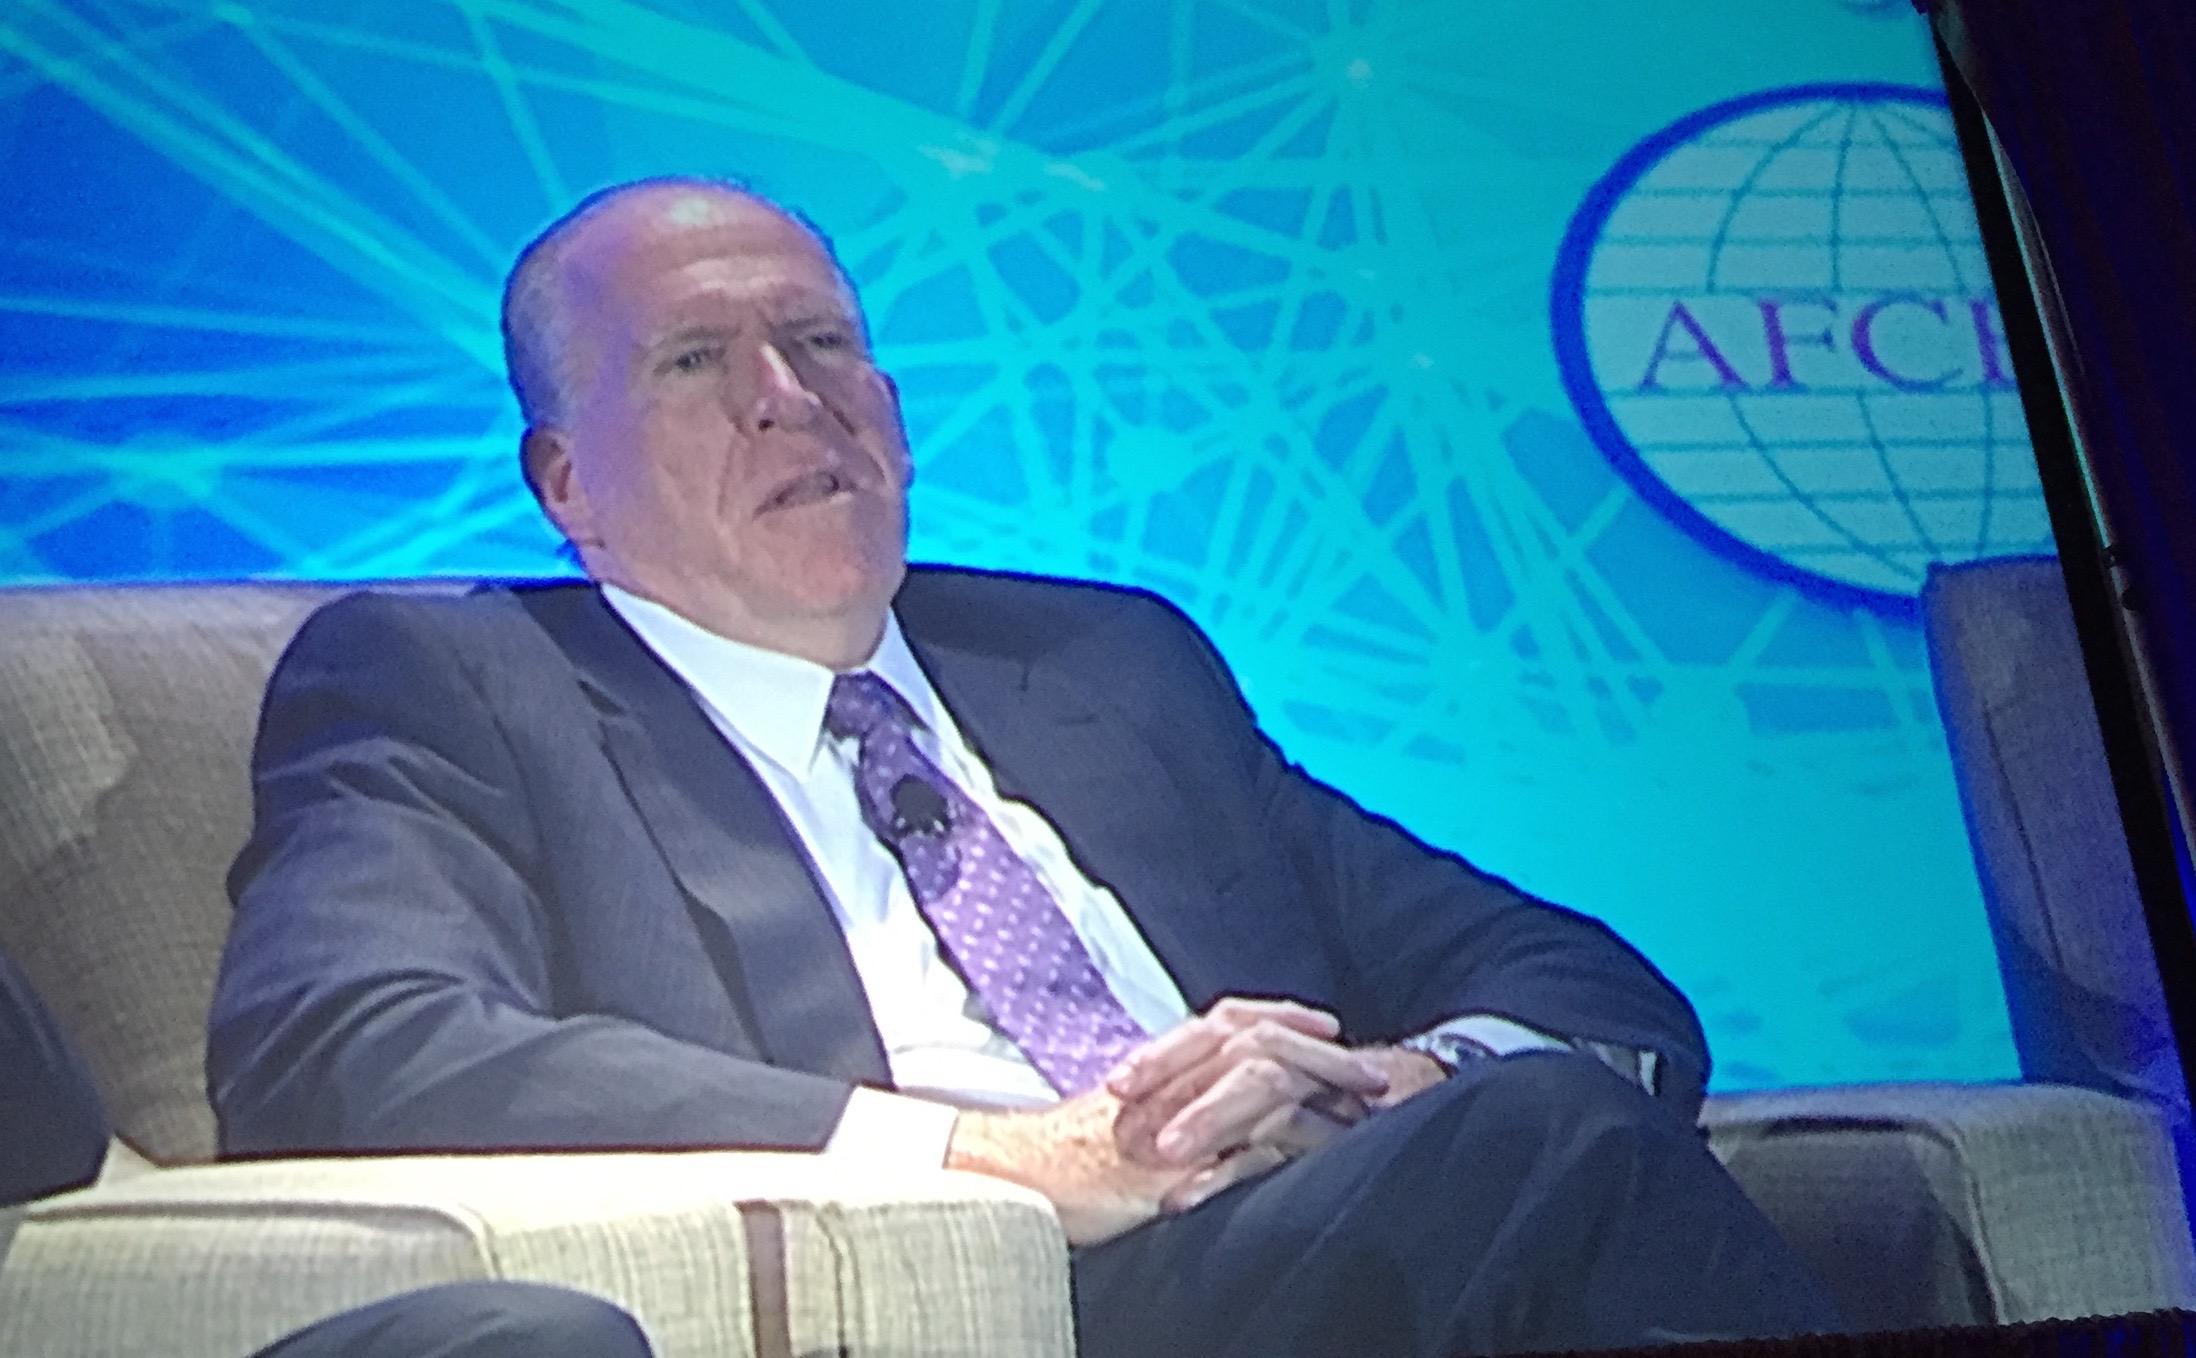 Did John Brennan suck as a contractor? The CIA thinks so